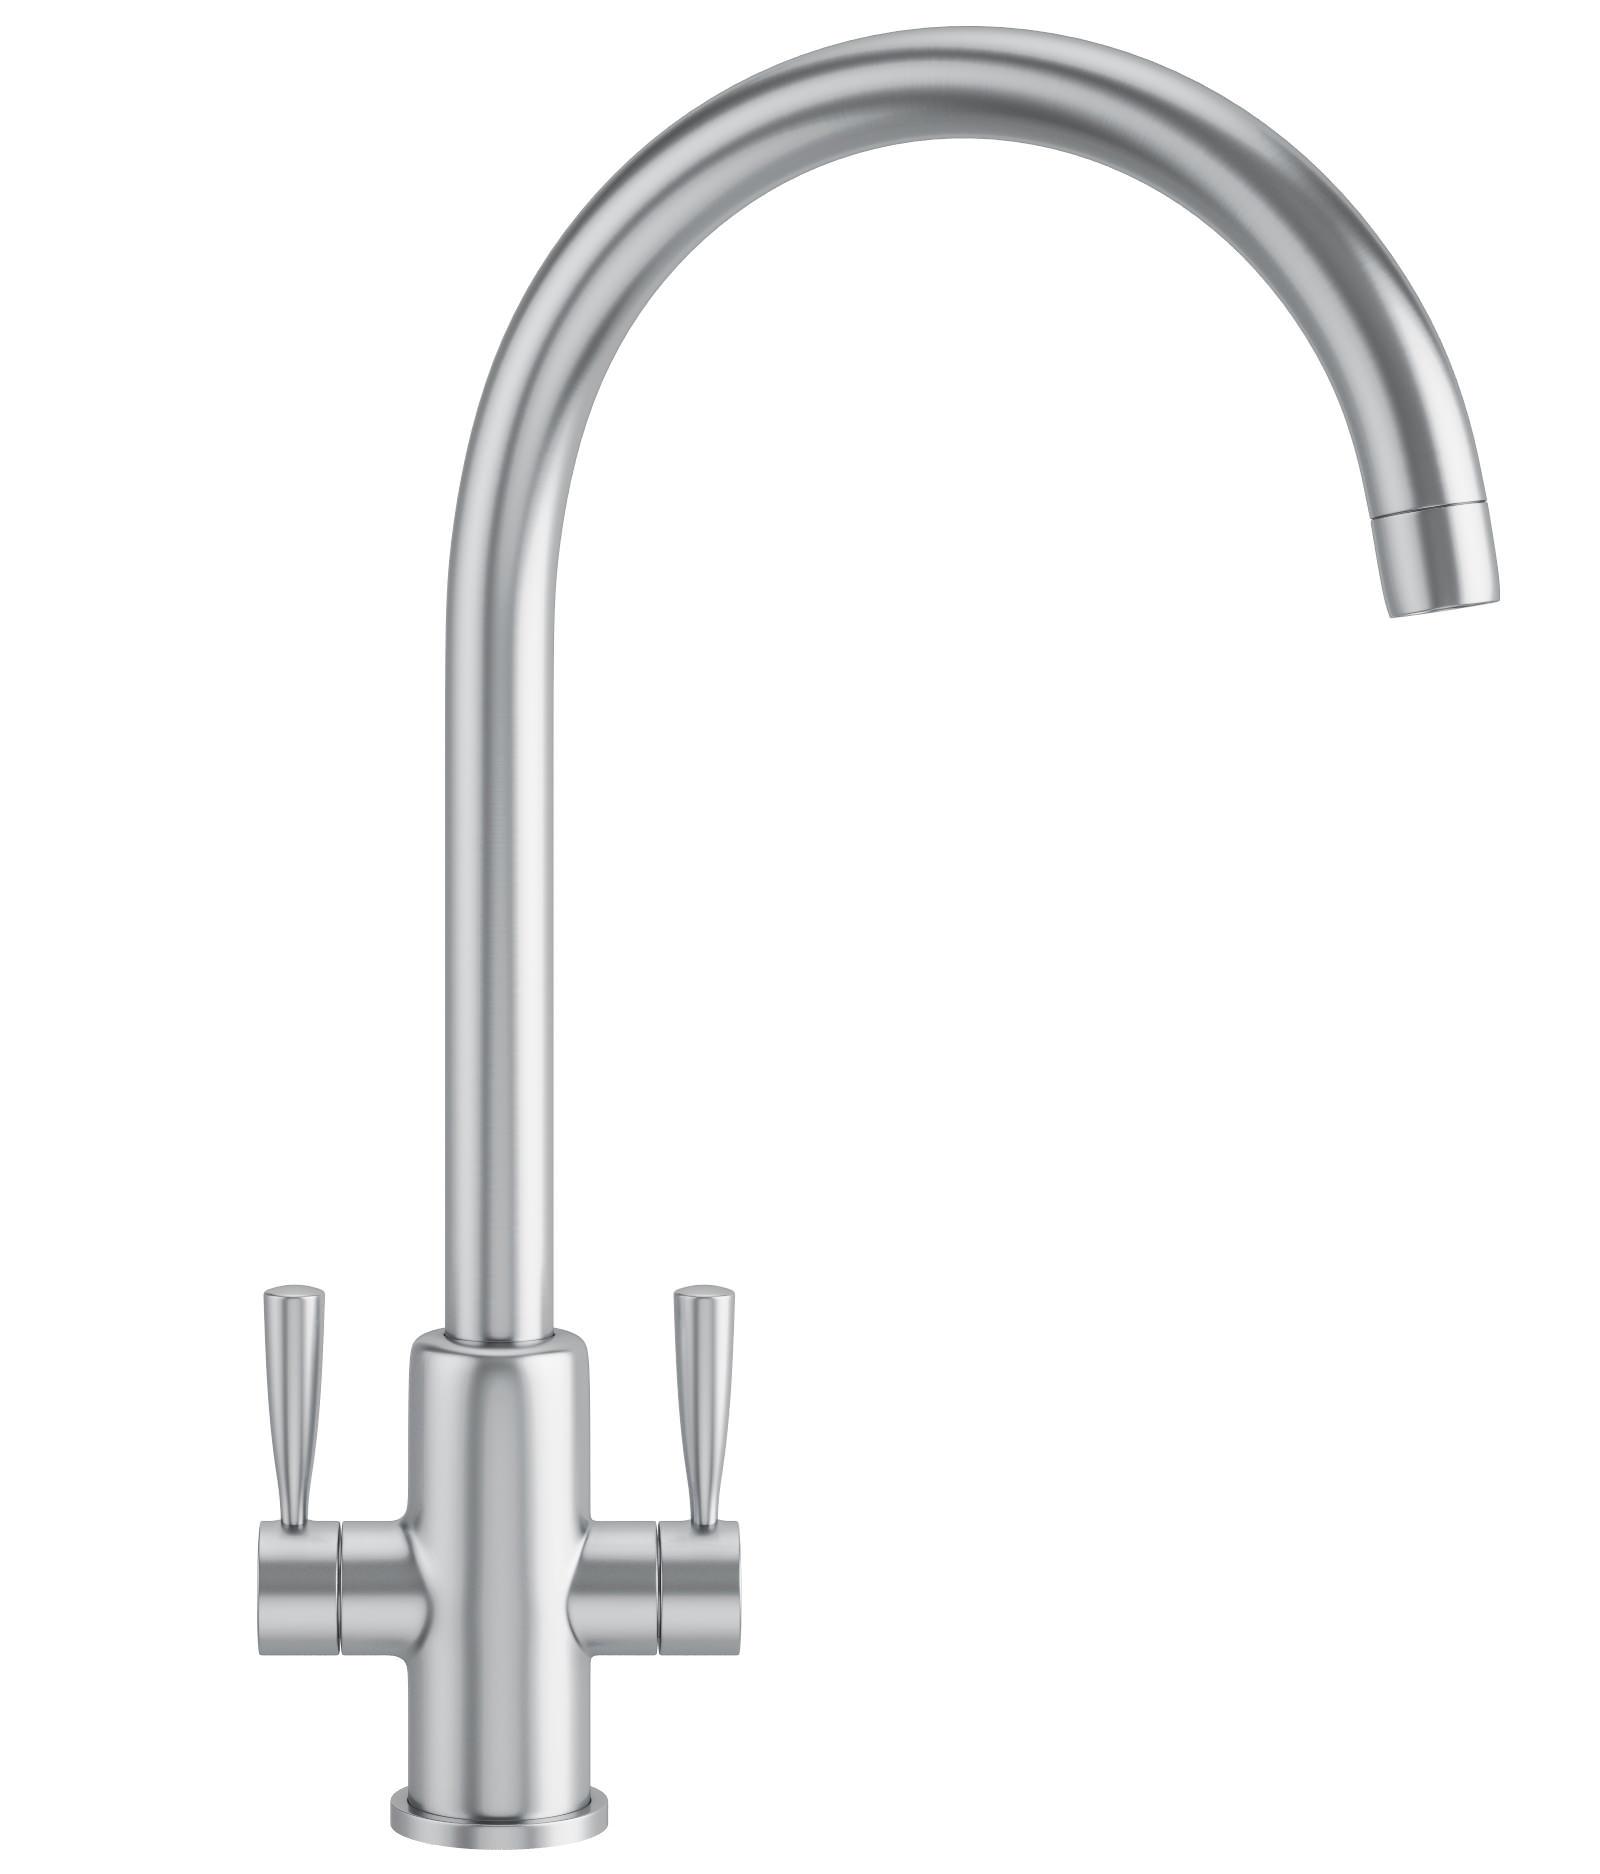 franke ascona kitchen sink mixer tap silksteel 1150250636. Black Bedroom Furniture Sets. Home Design Ideas